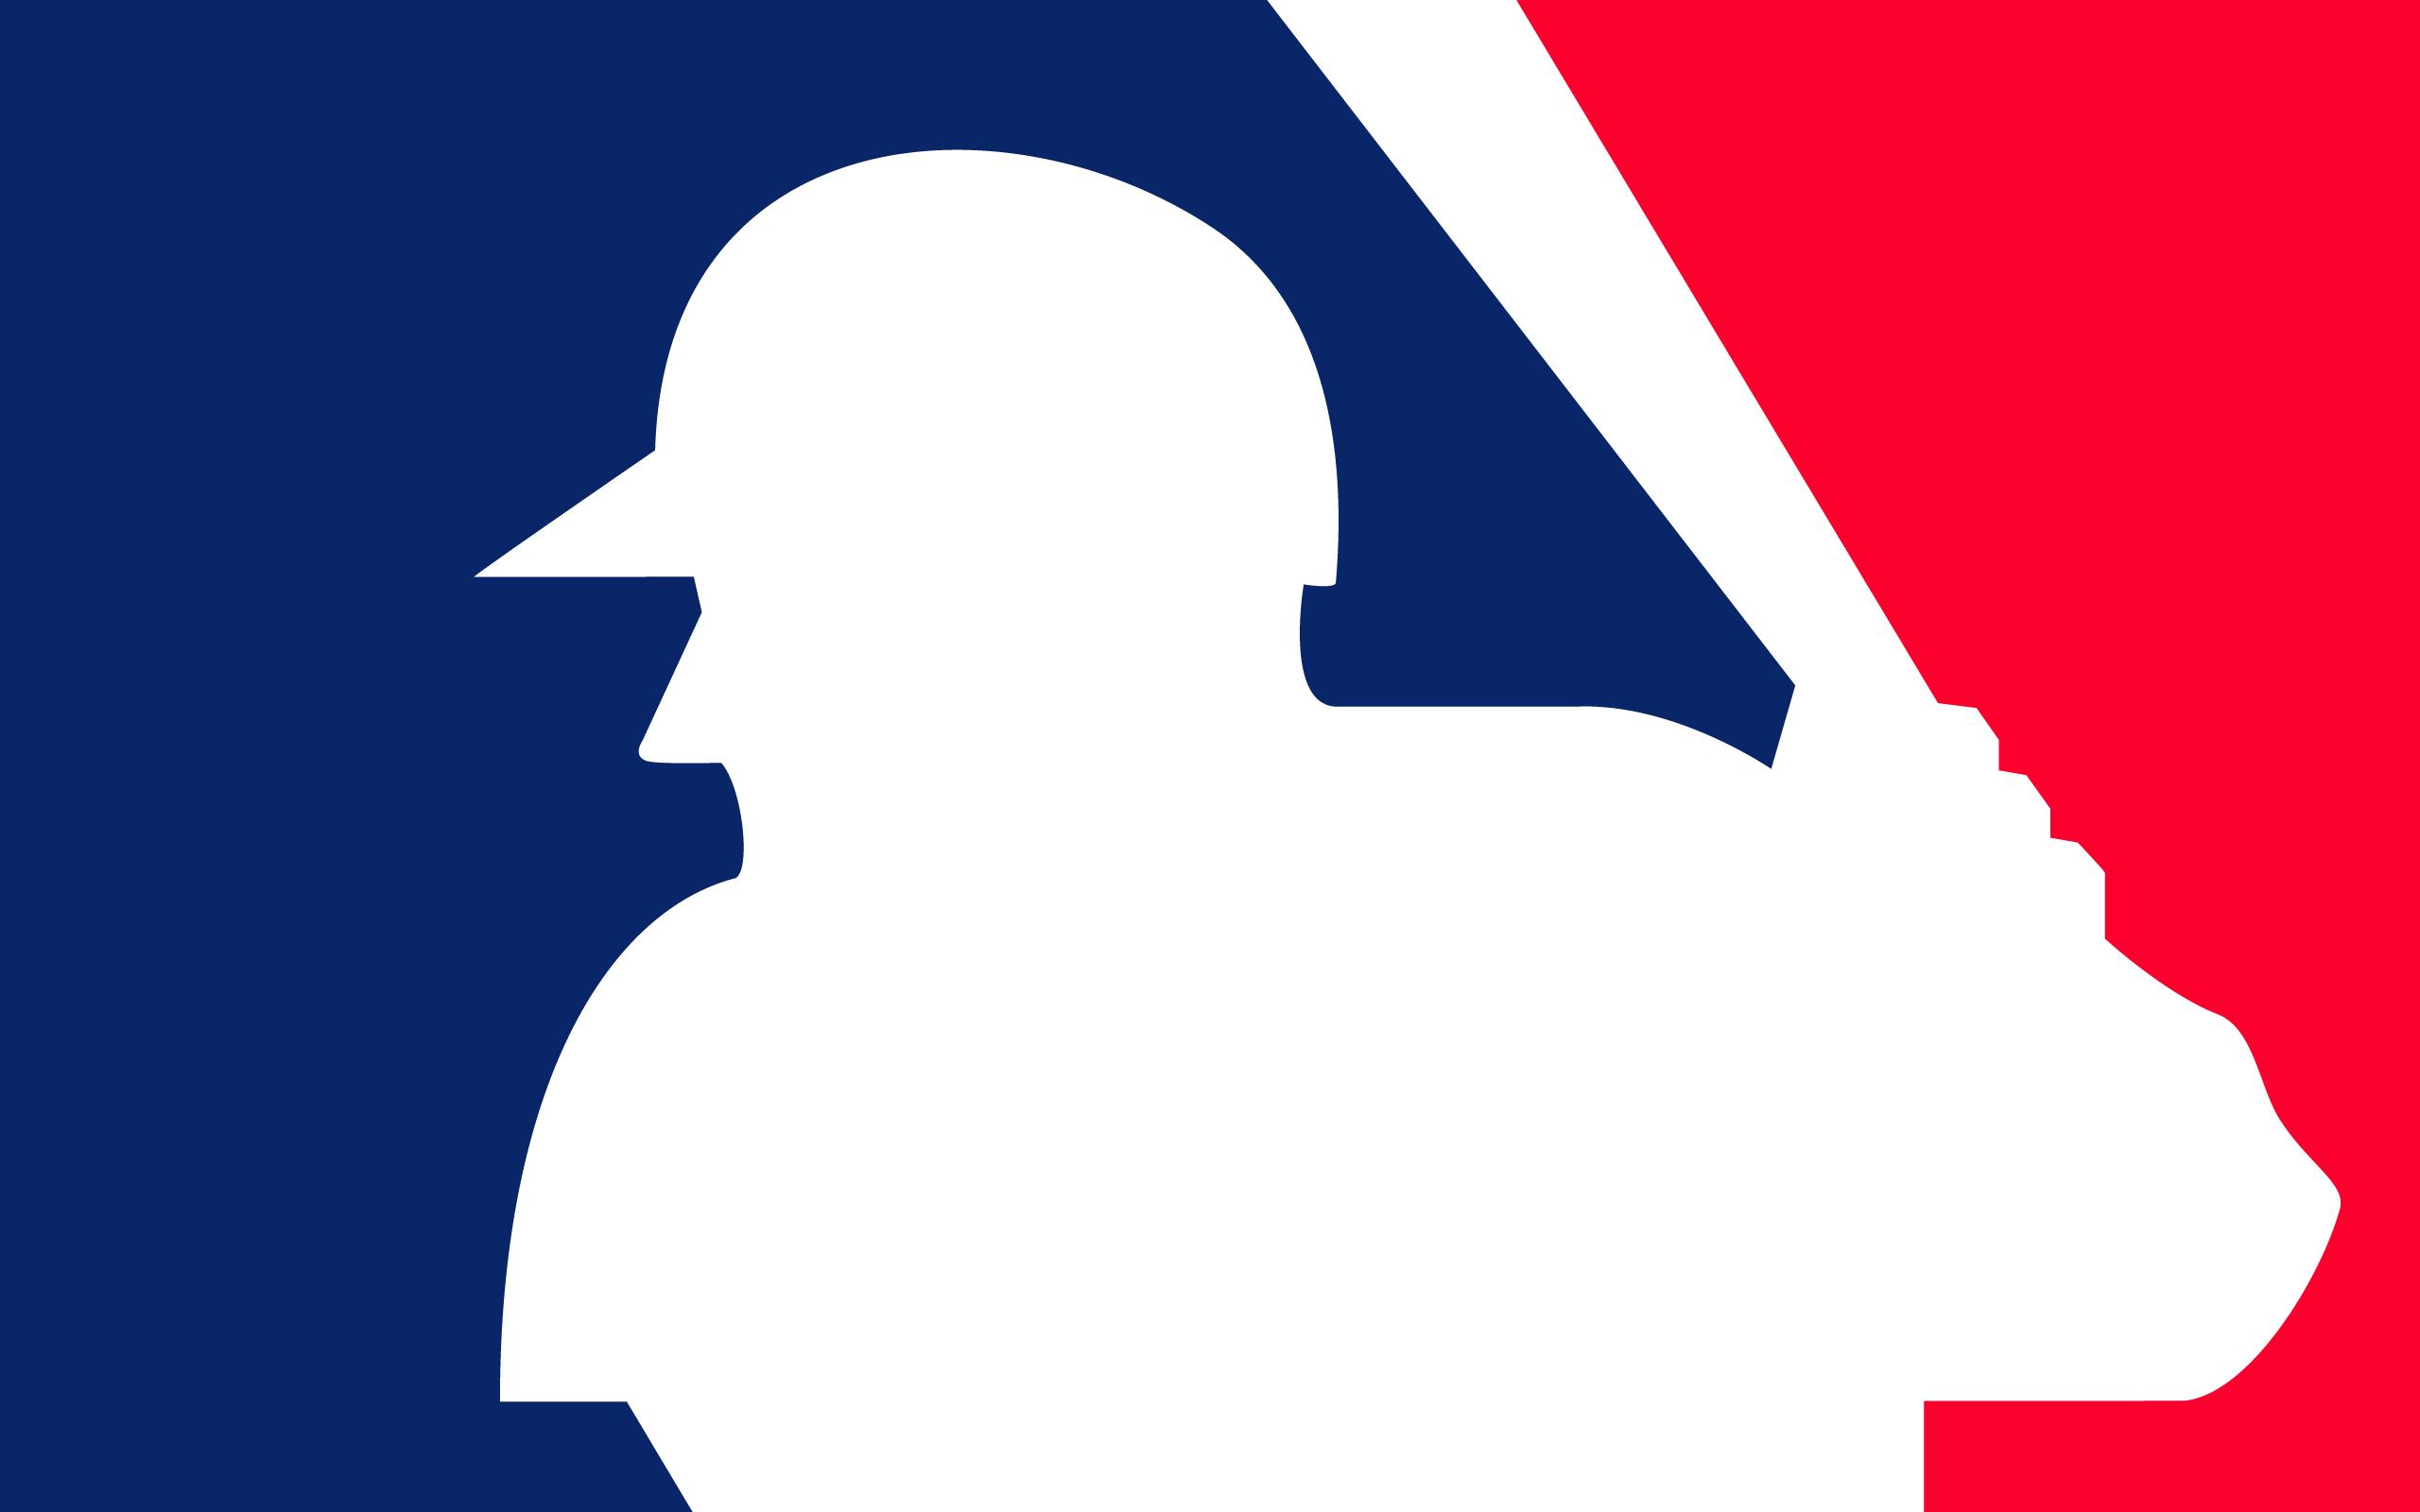 MLB Logo 2560x1600 Wallpaper 2560x1600